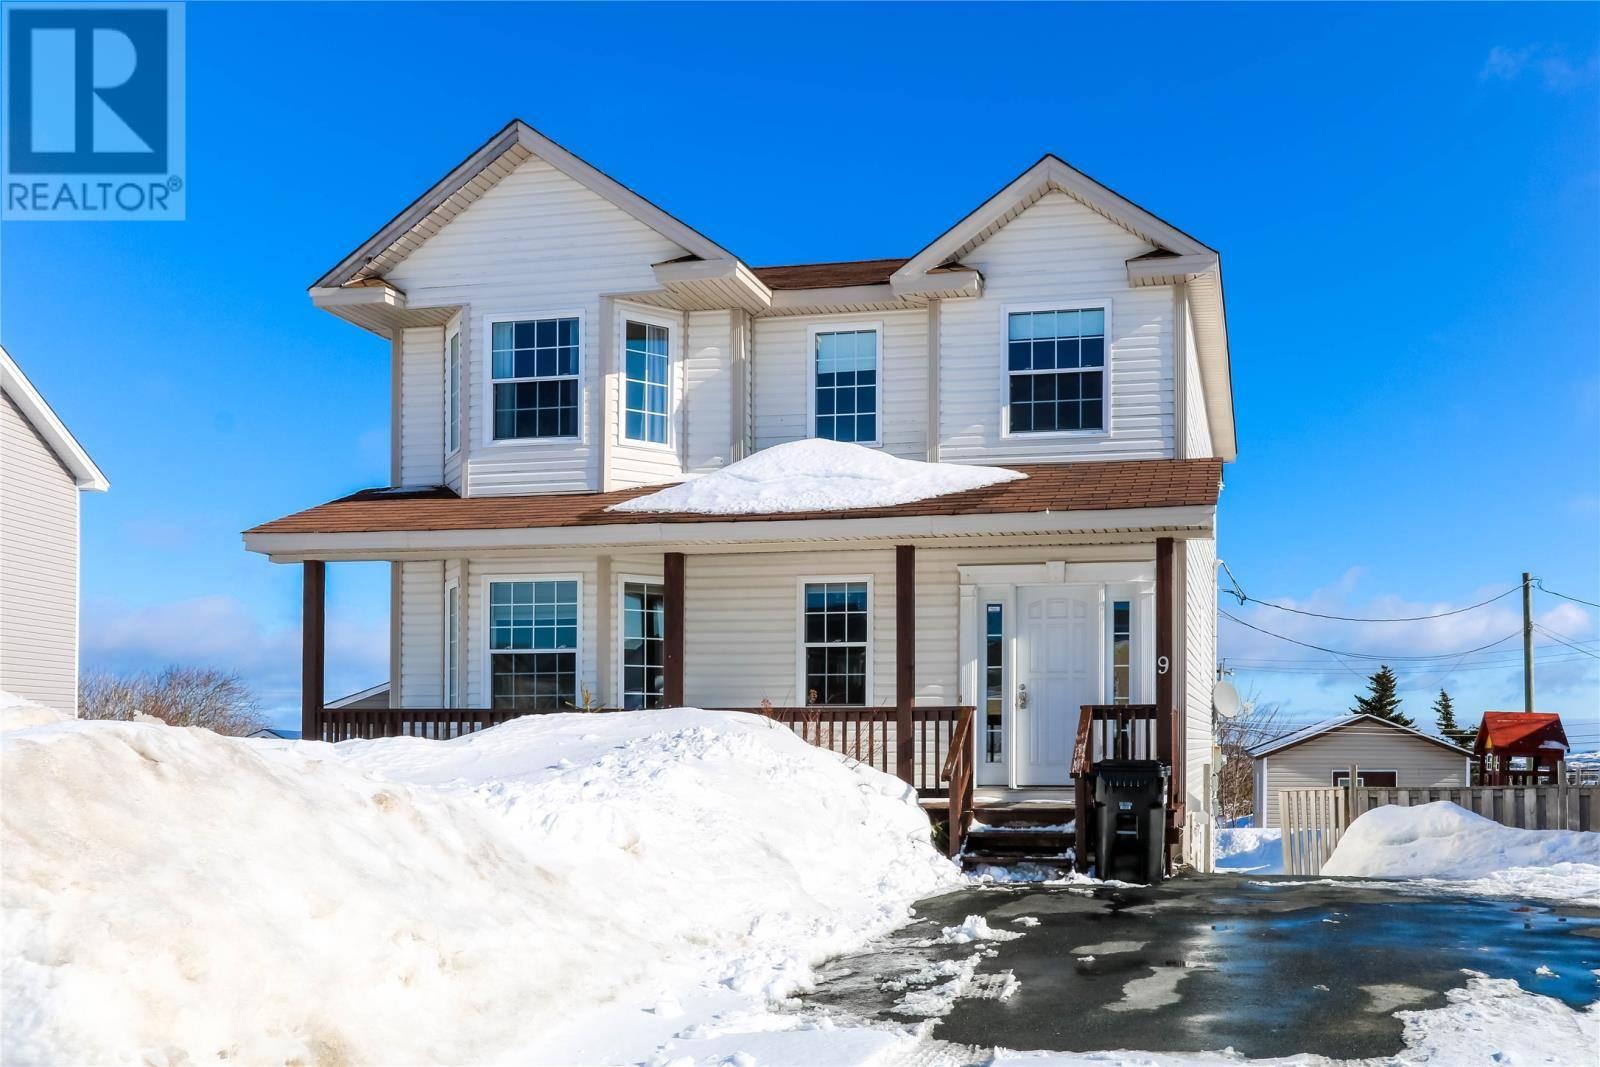 House for sale at 9 Kincaid St St. John's Newfoundland - MLS: 1211416